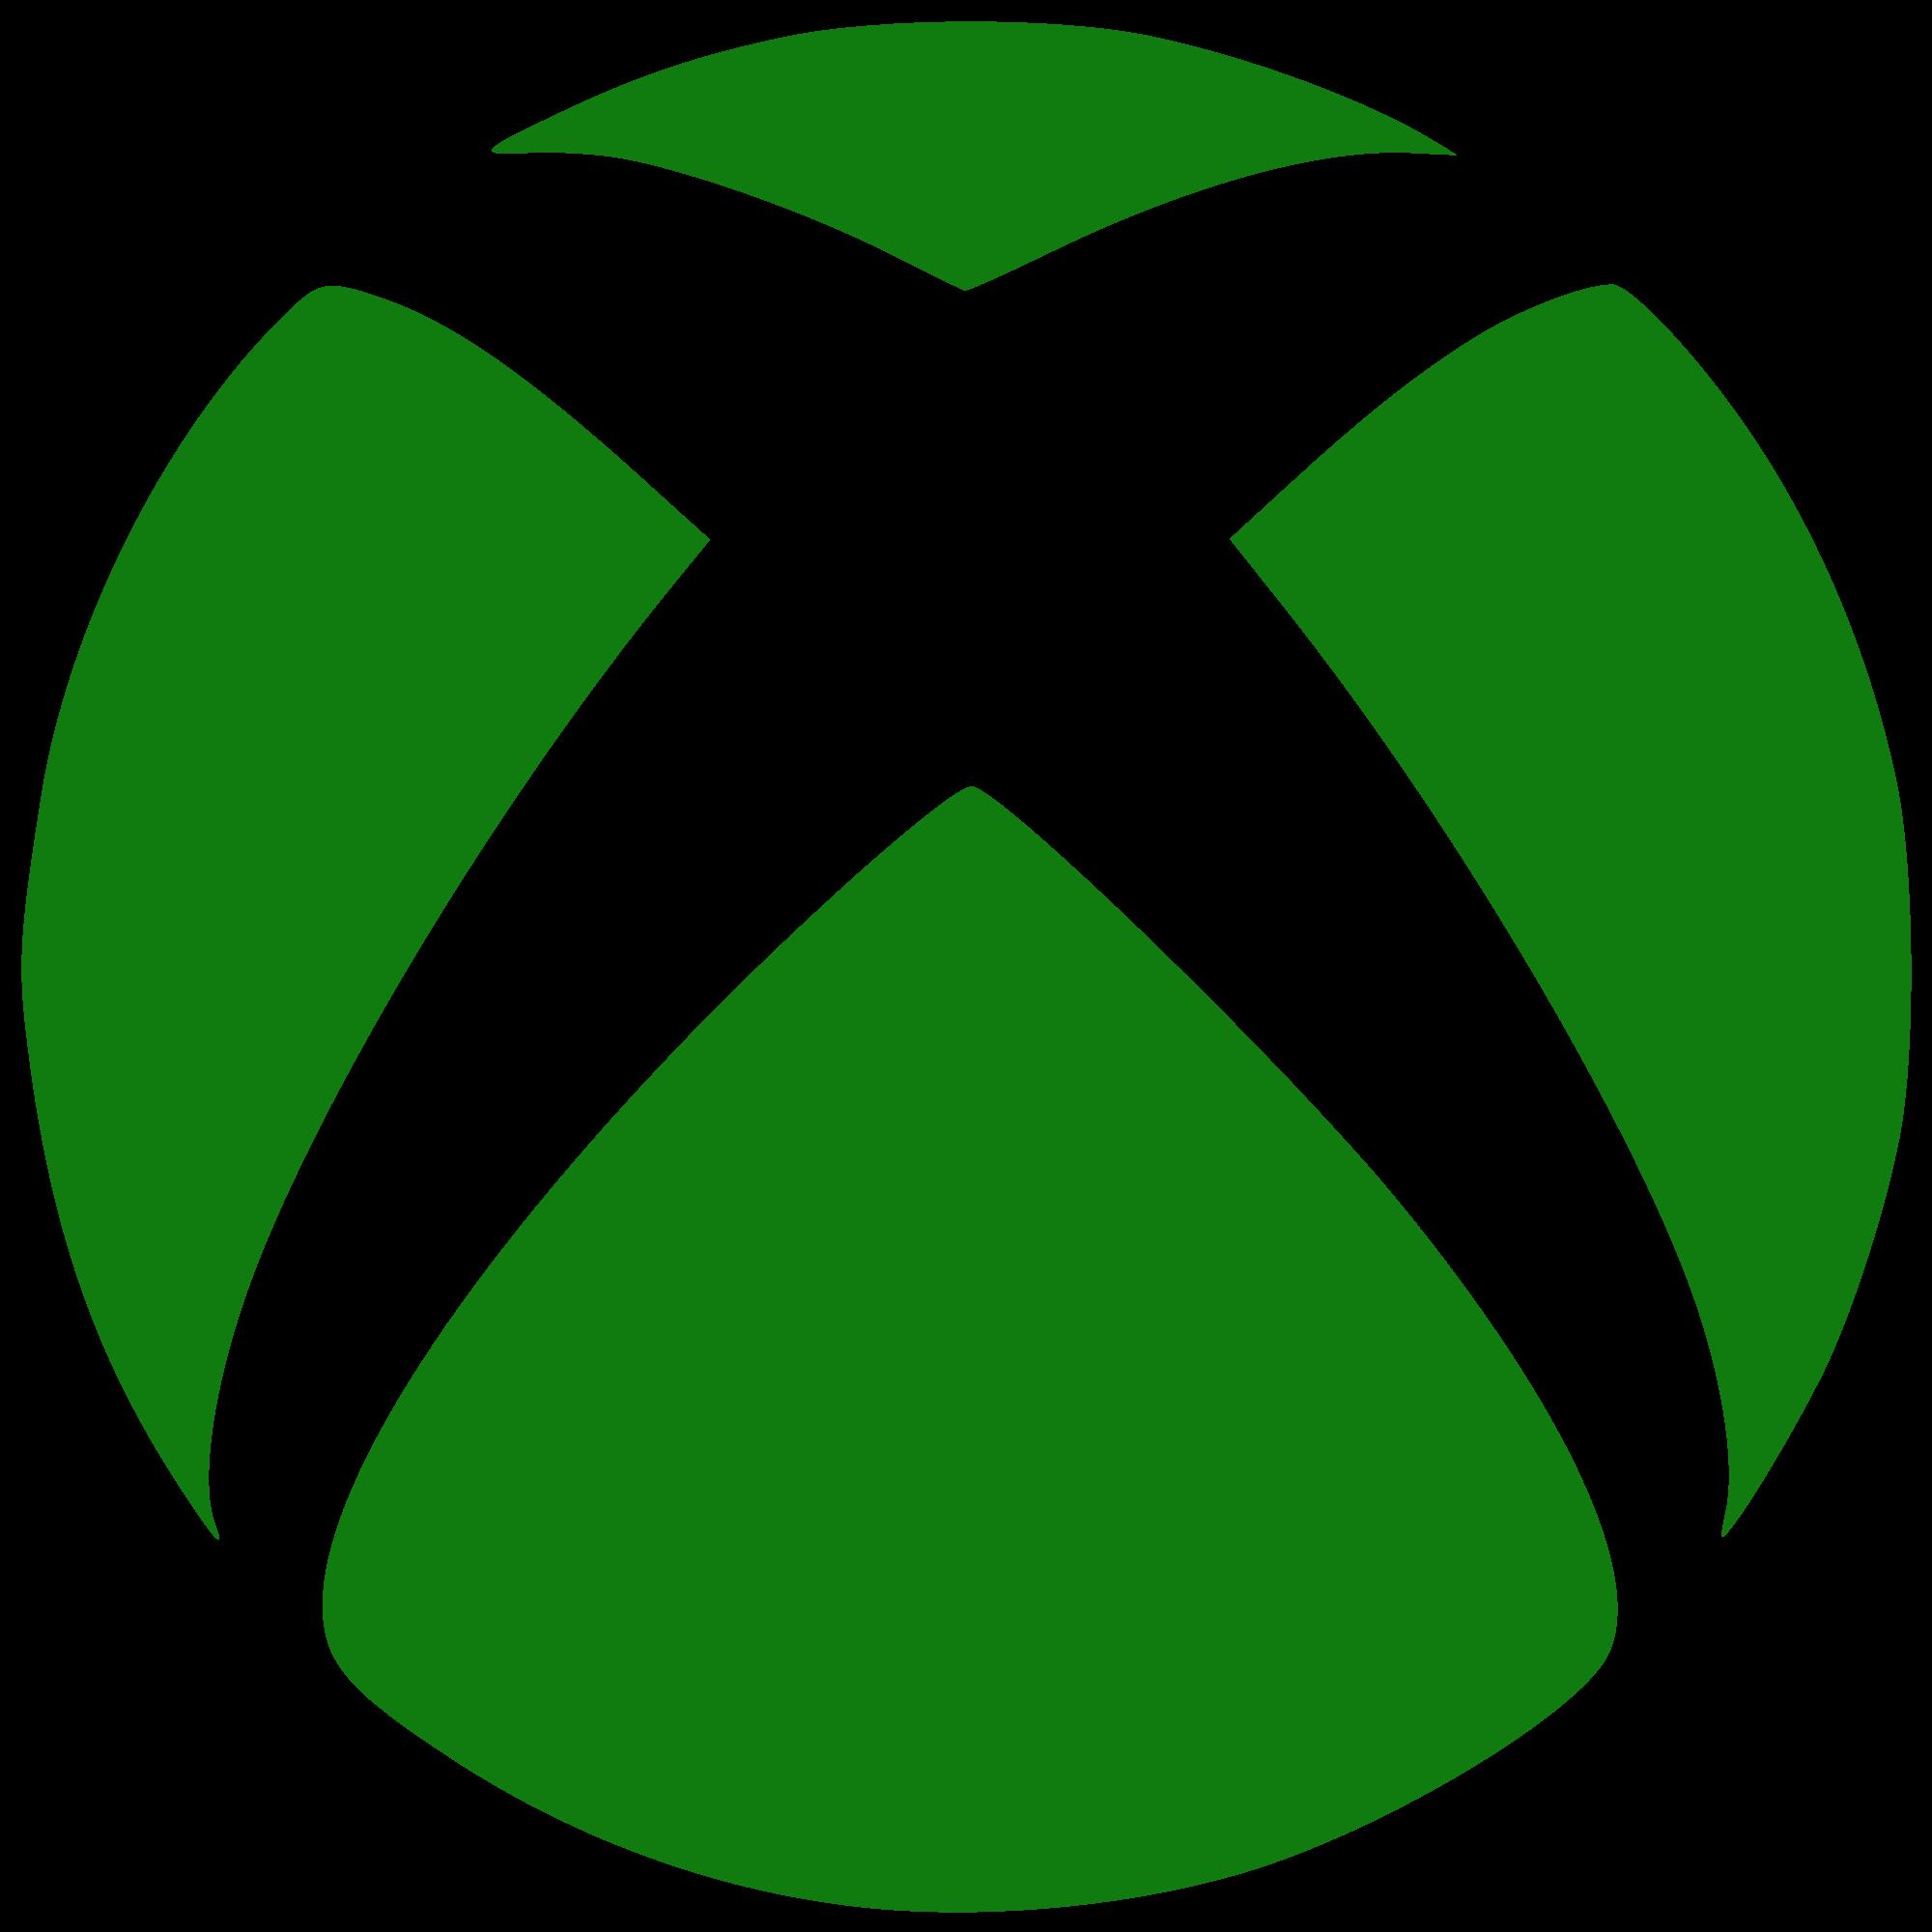 xbox logo.png